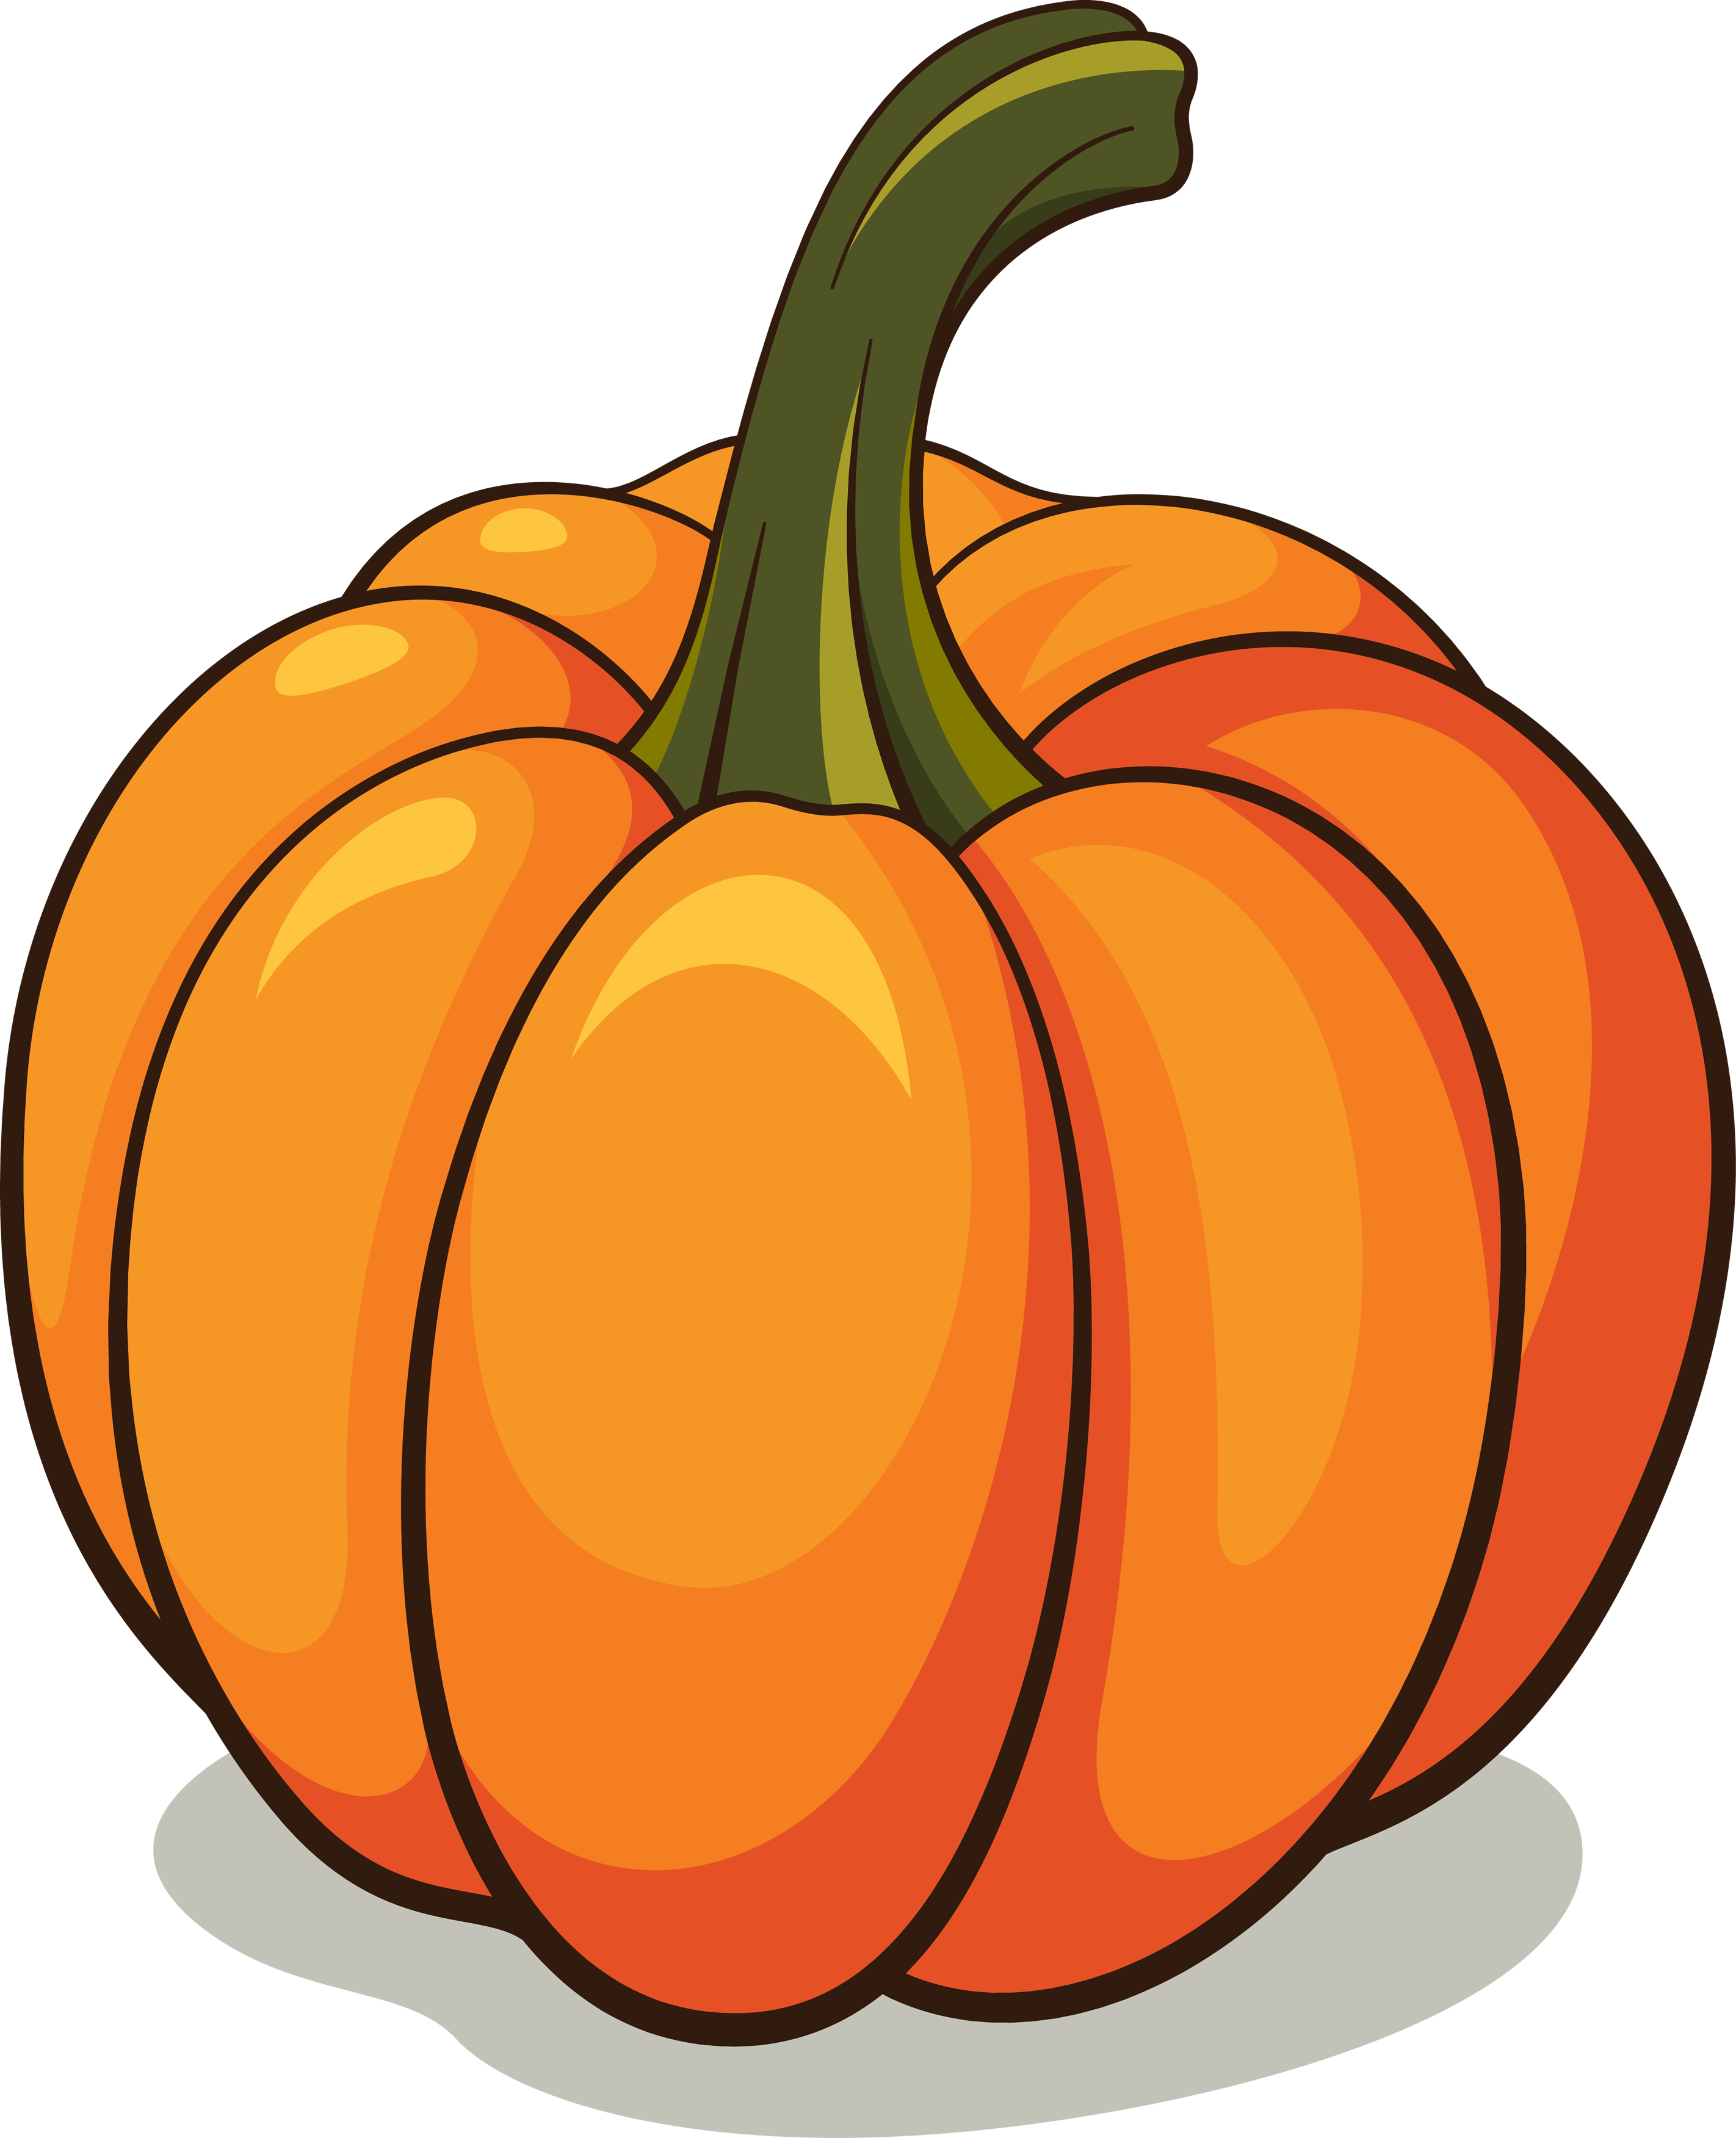 Pumpkin clipart biezumd.